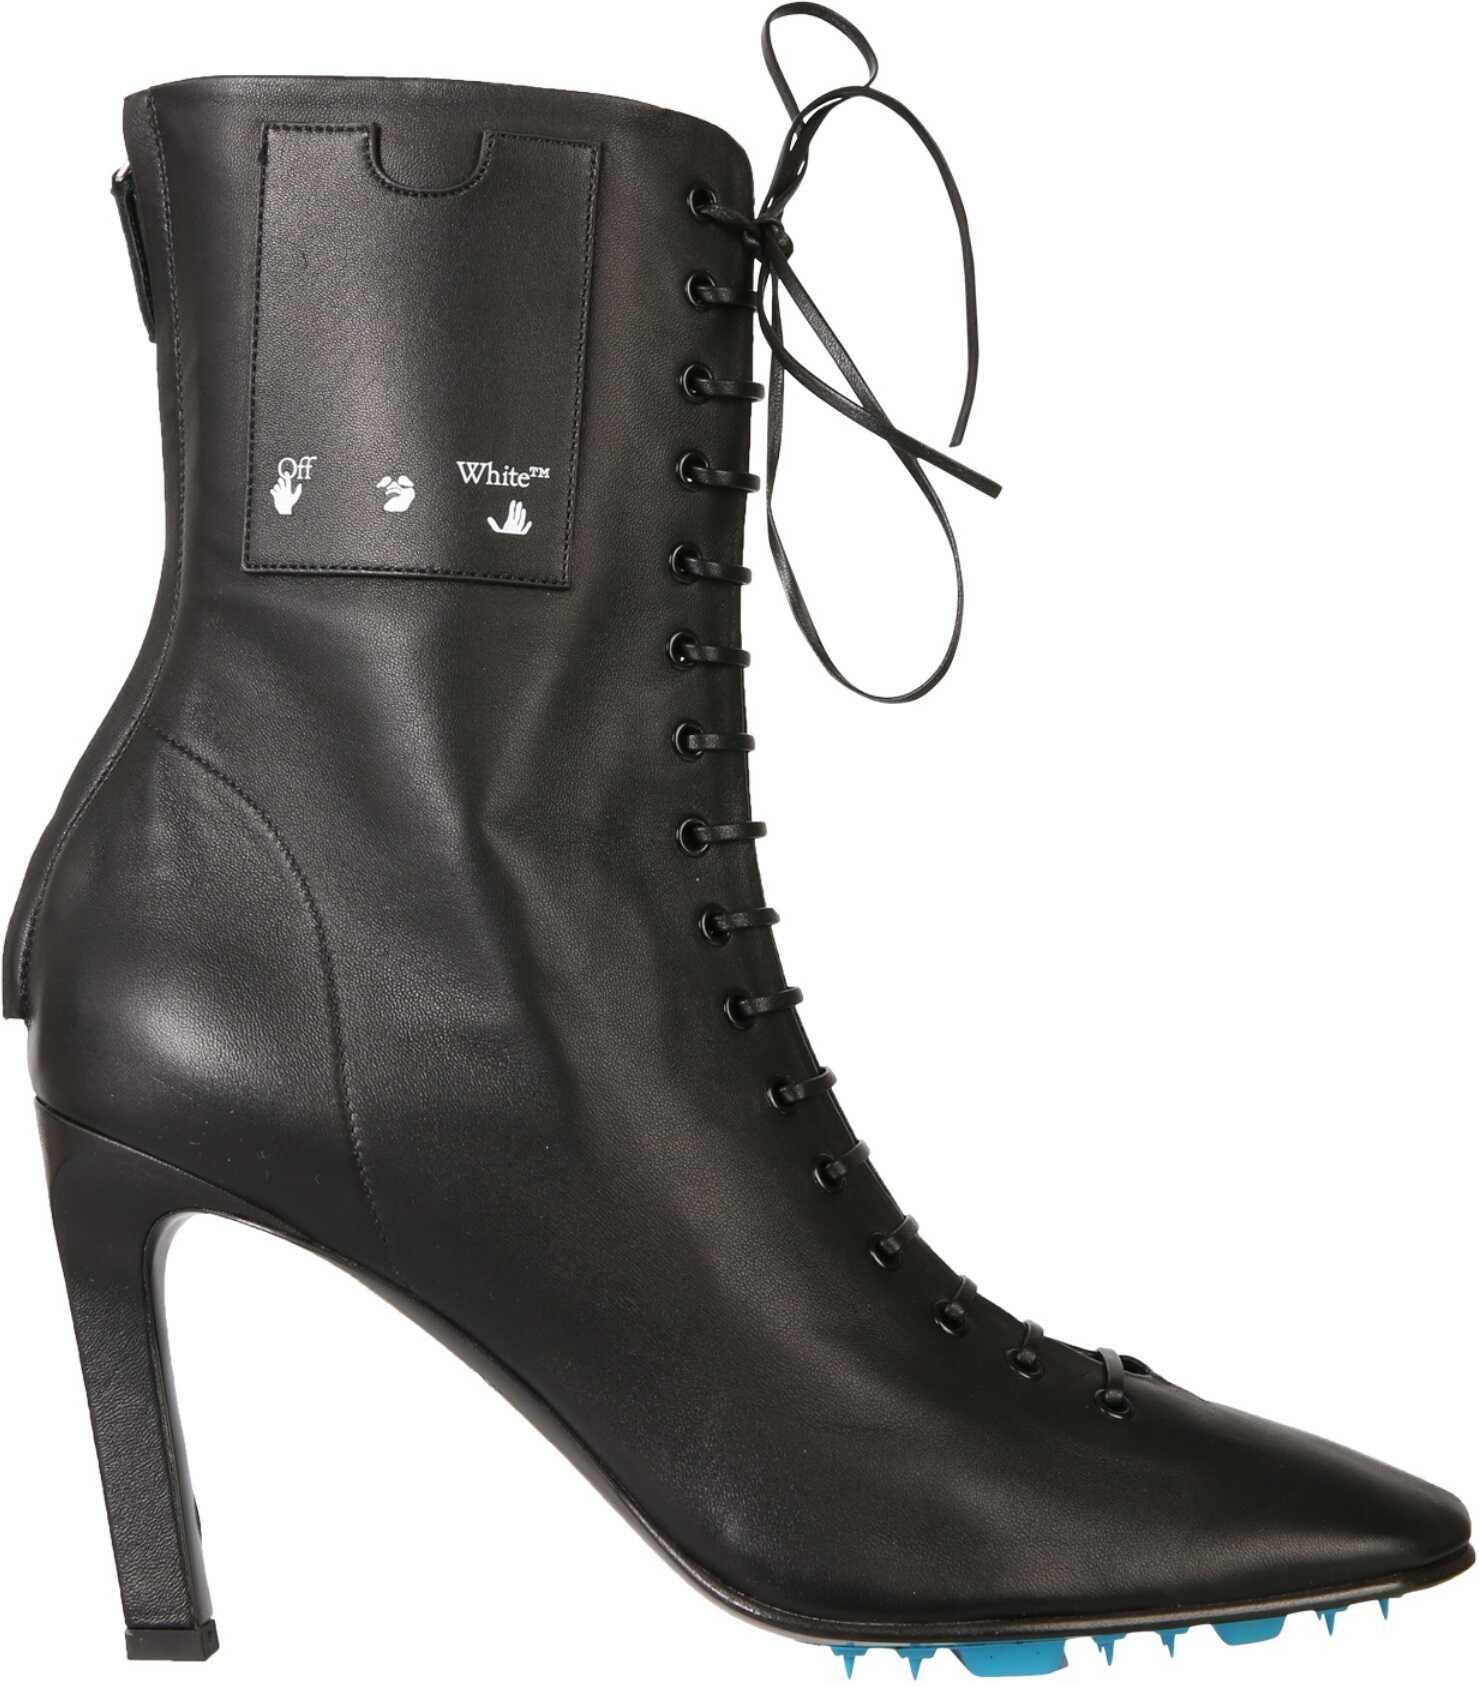 Off-White Boots With Laces OWIA248_E20LEA0011000 BLACK imagine b-mall.ro